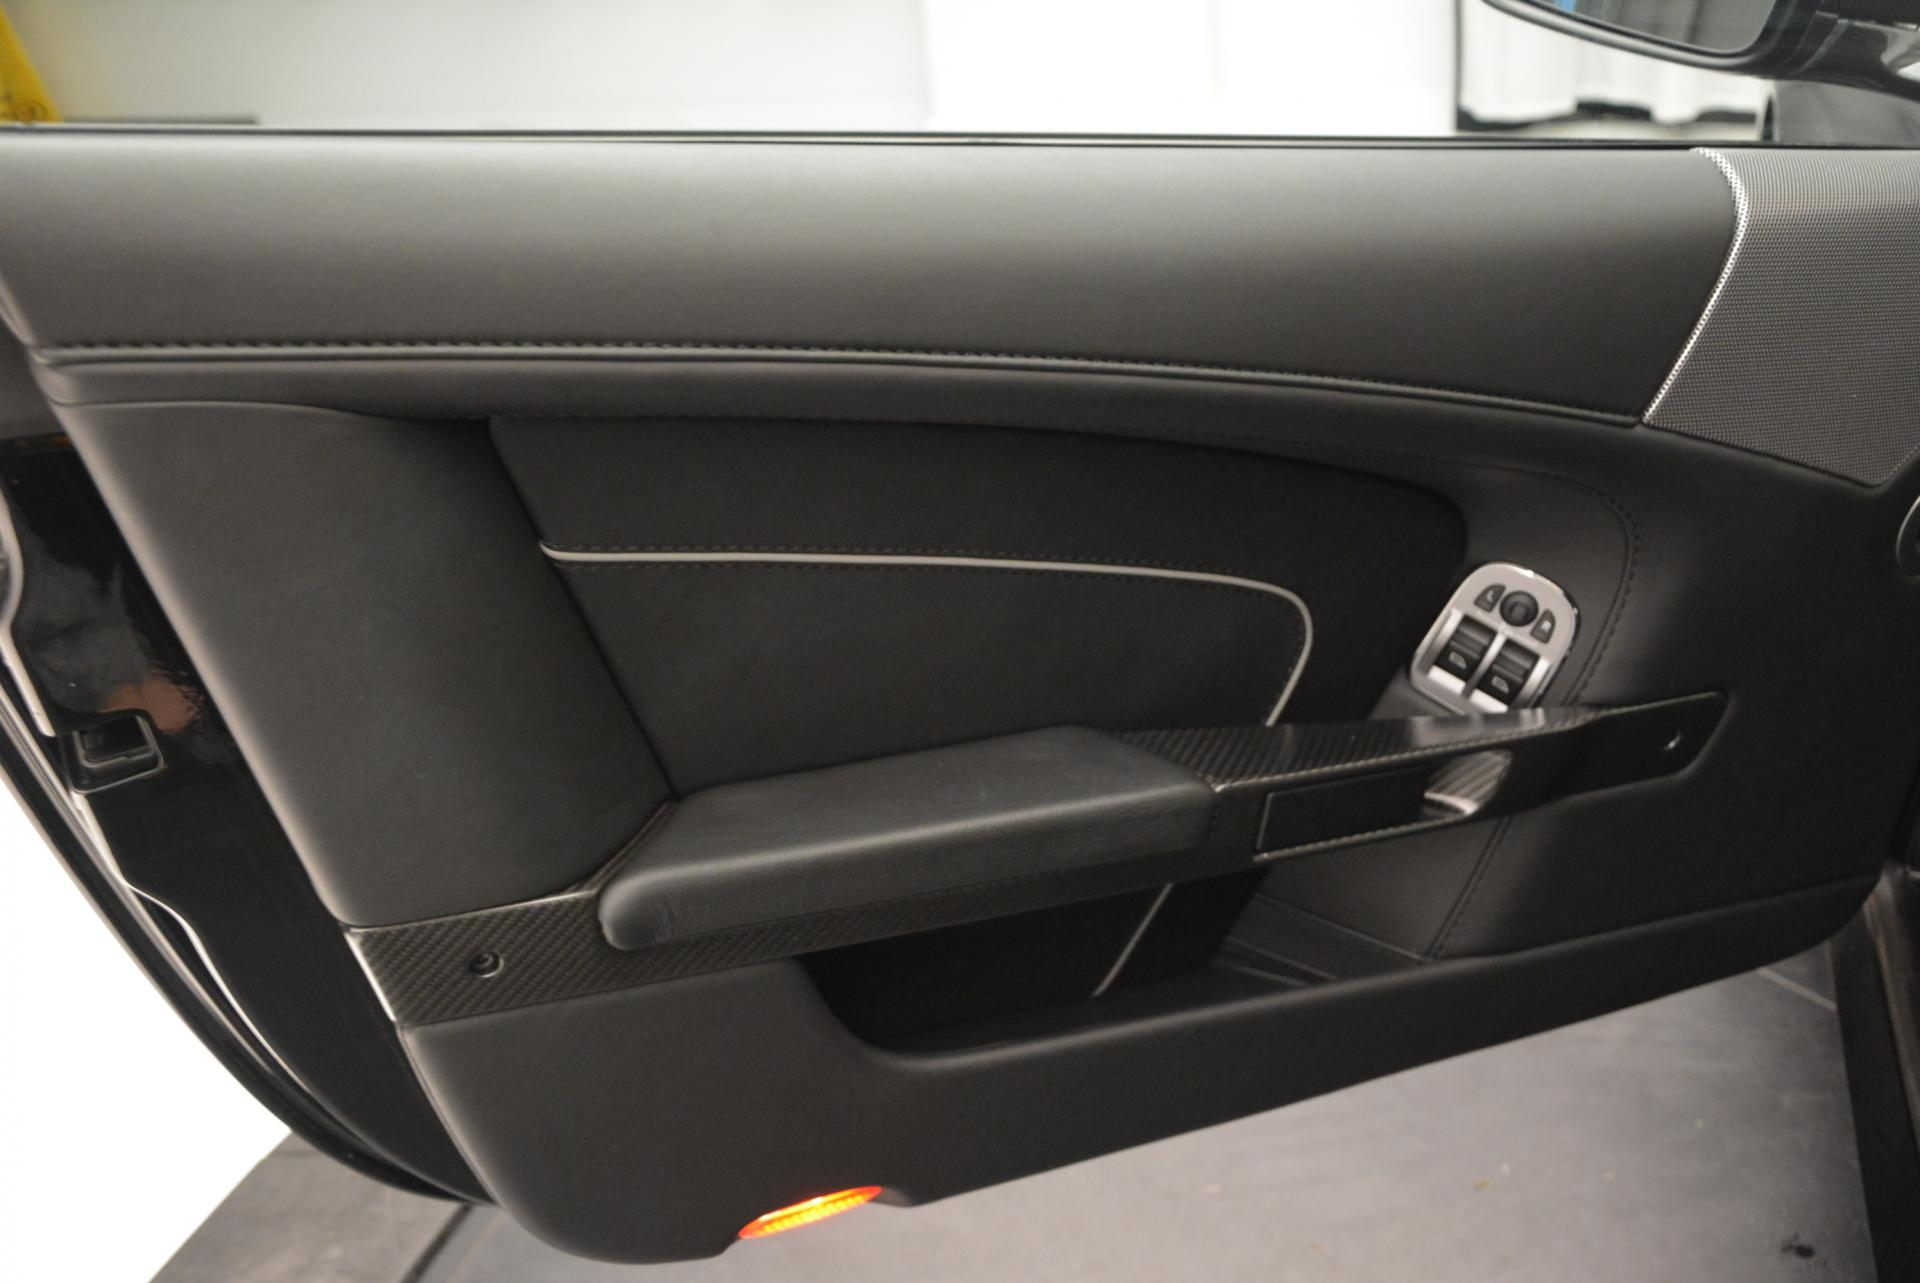 Used 2015 Aston Martin DB9 Carbon Edition For Sale In Greenwich, CT. Alfa Romeo of Greenwich, 7349 528_p16